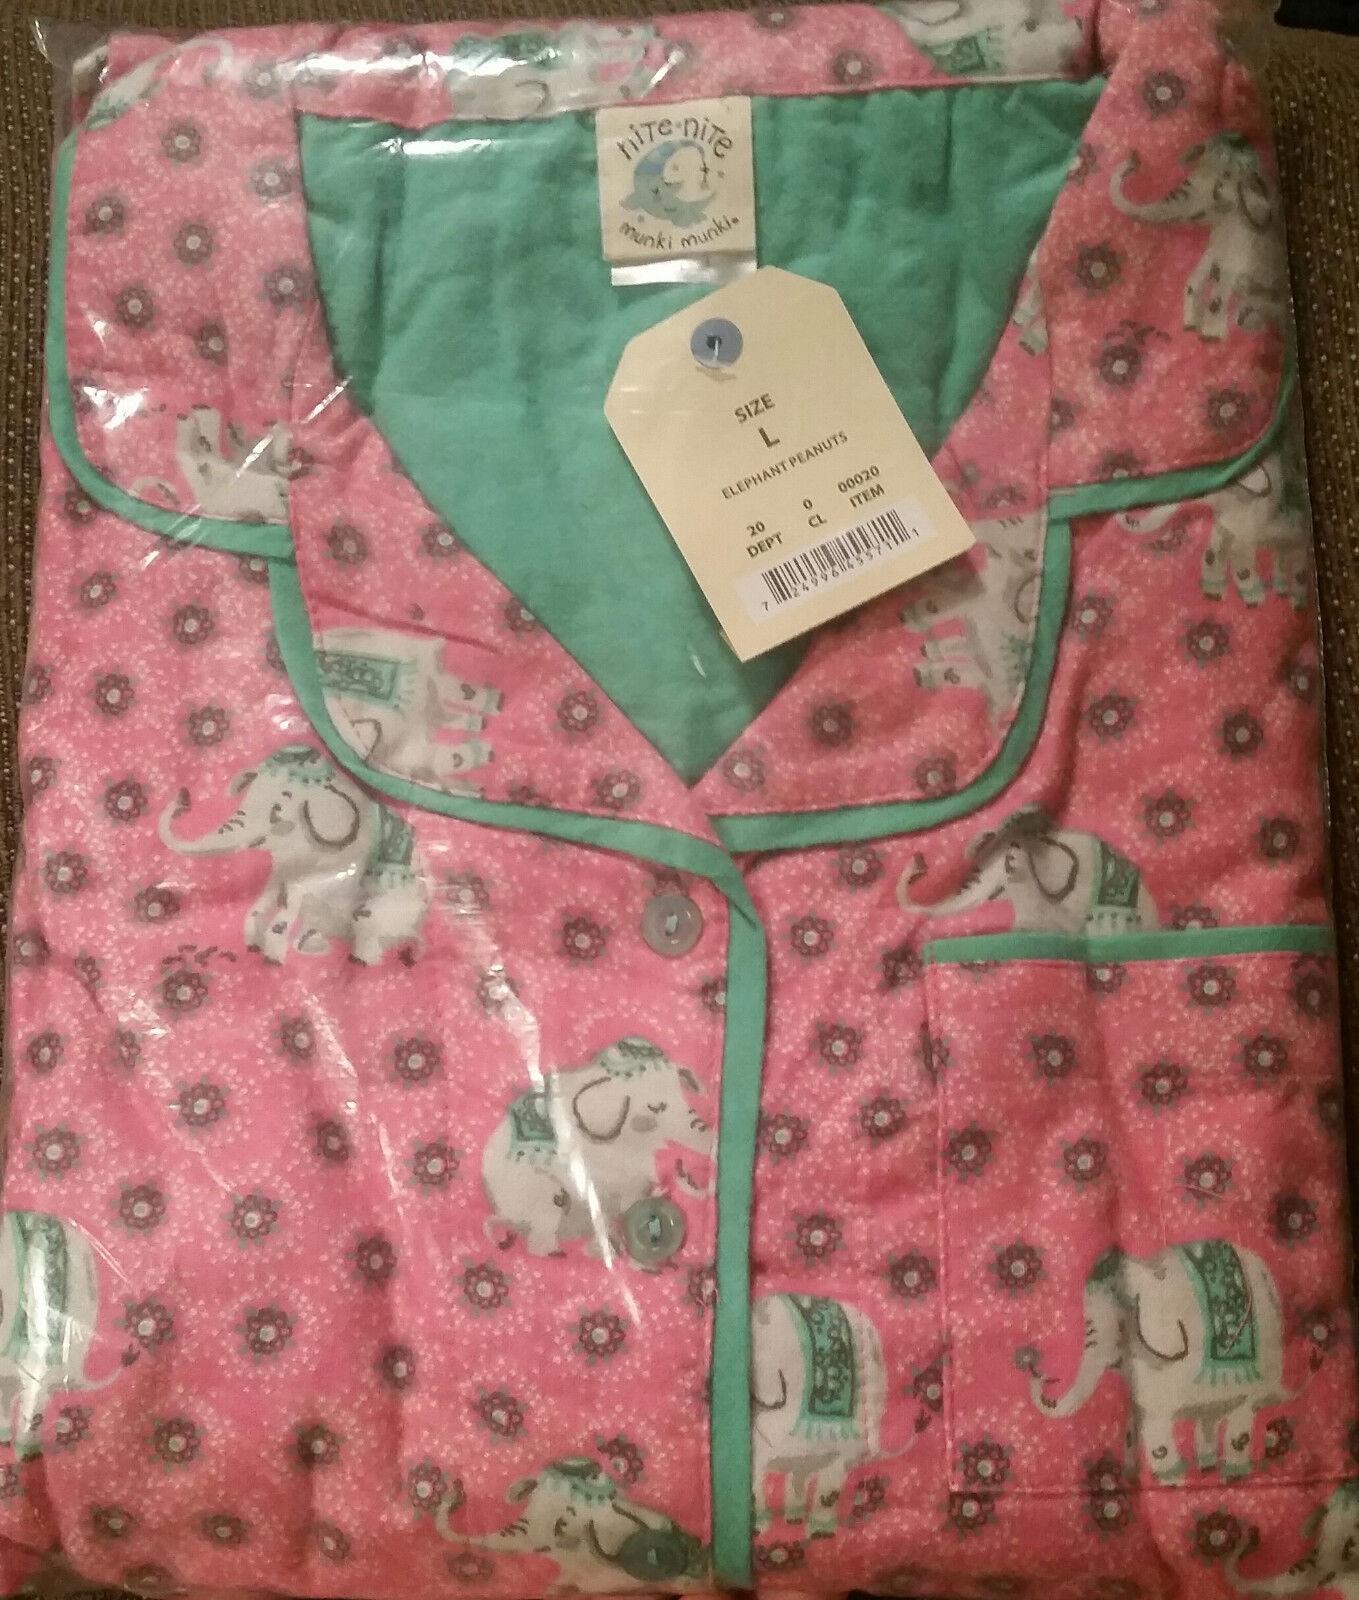 Munki Munki Nite Nite PINK ELEPHANT 2PC Pajamas  Womens  XL  Flannel  PJ'S NEW